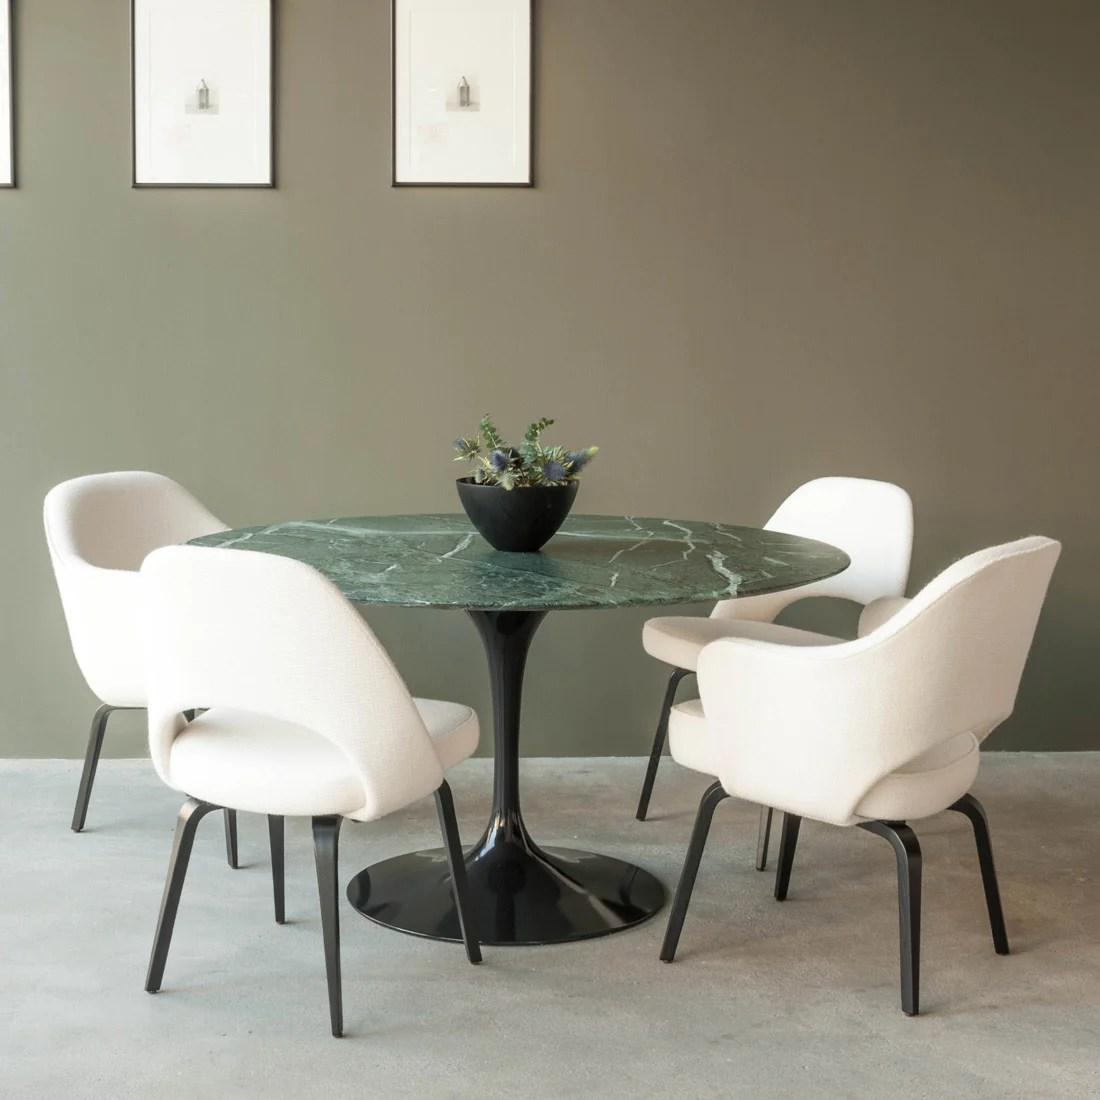 tulip table and chairs lovesac bean bag chair haus dining by eero saarinen knoll